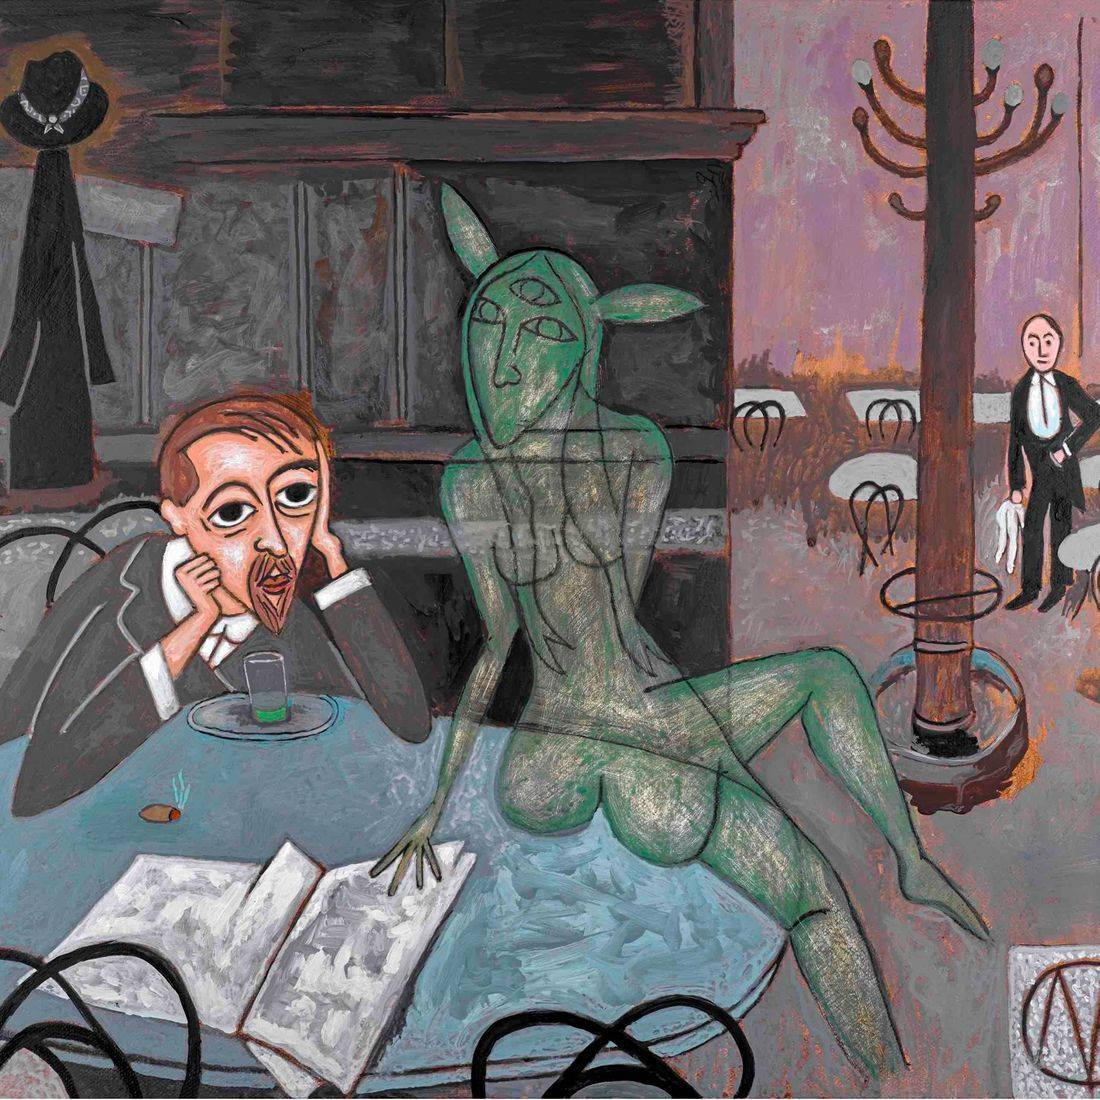 Absinthe, Viktor Oliva, Cafes, Diners, Restaurants, Phantasms